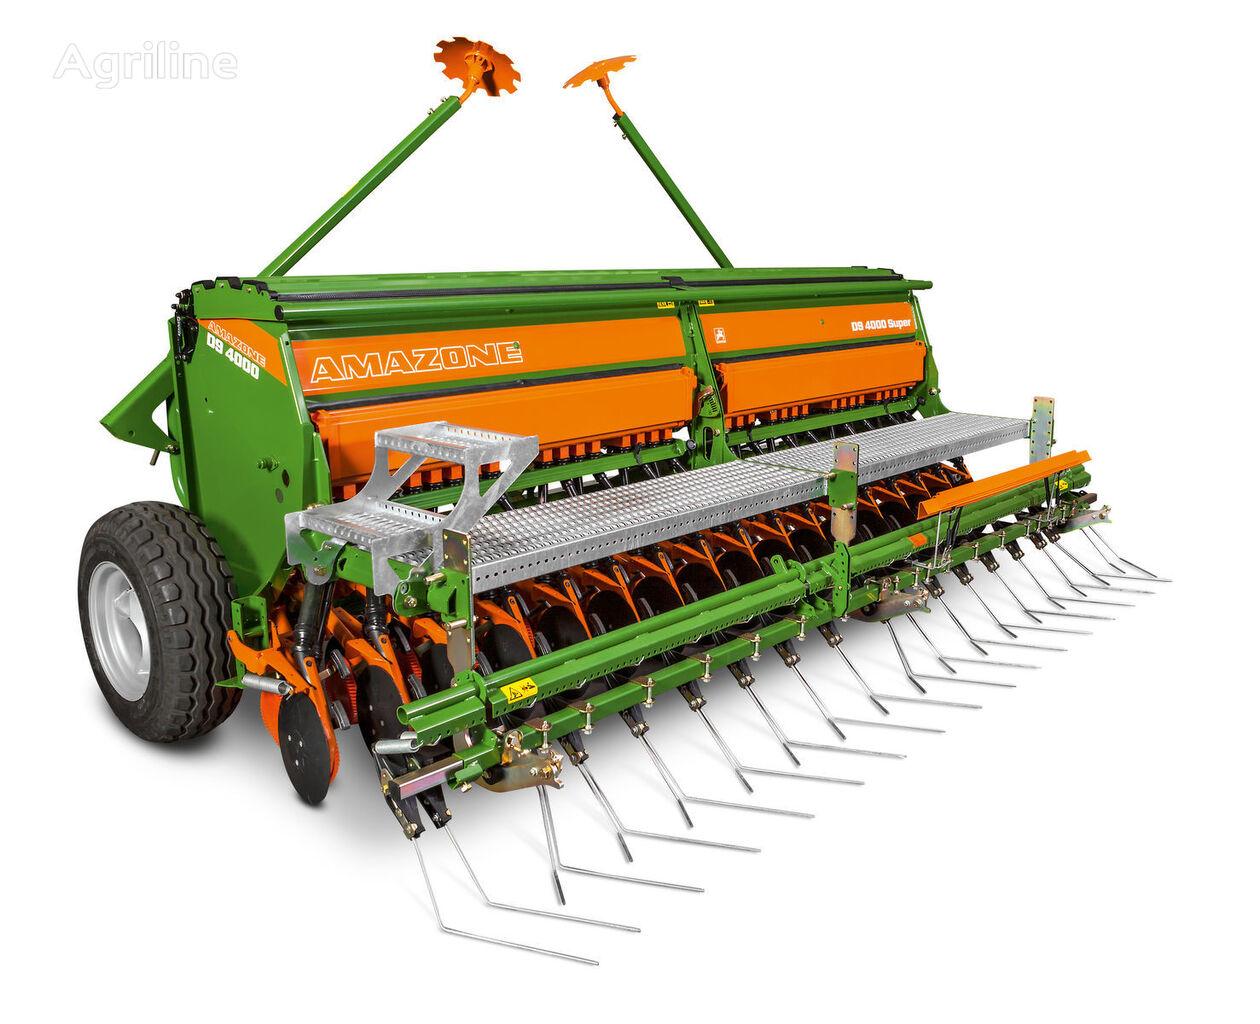 AMAZONE D9 4000, V NALIChII, TORG ! sembradora mecánica nueva